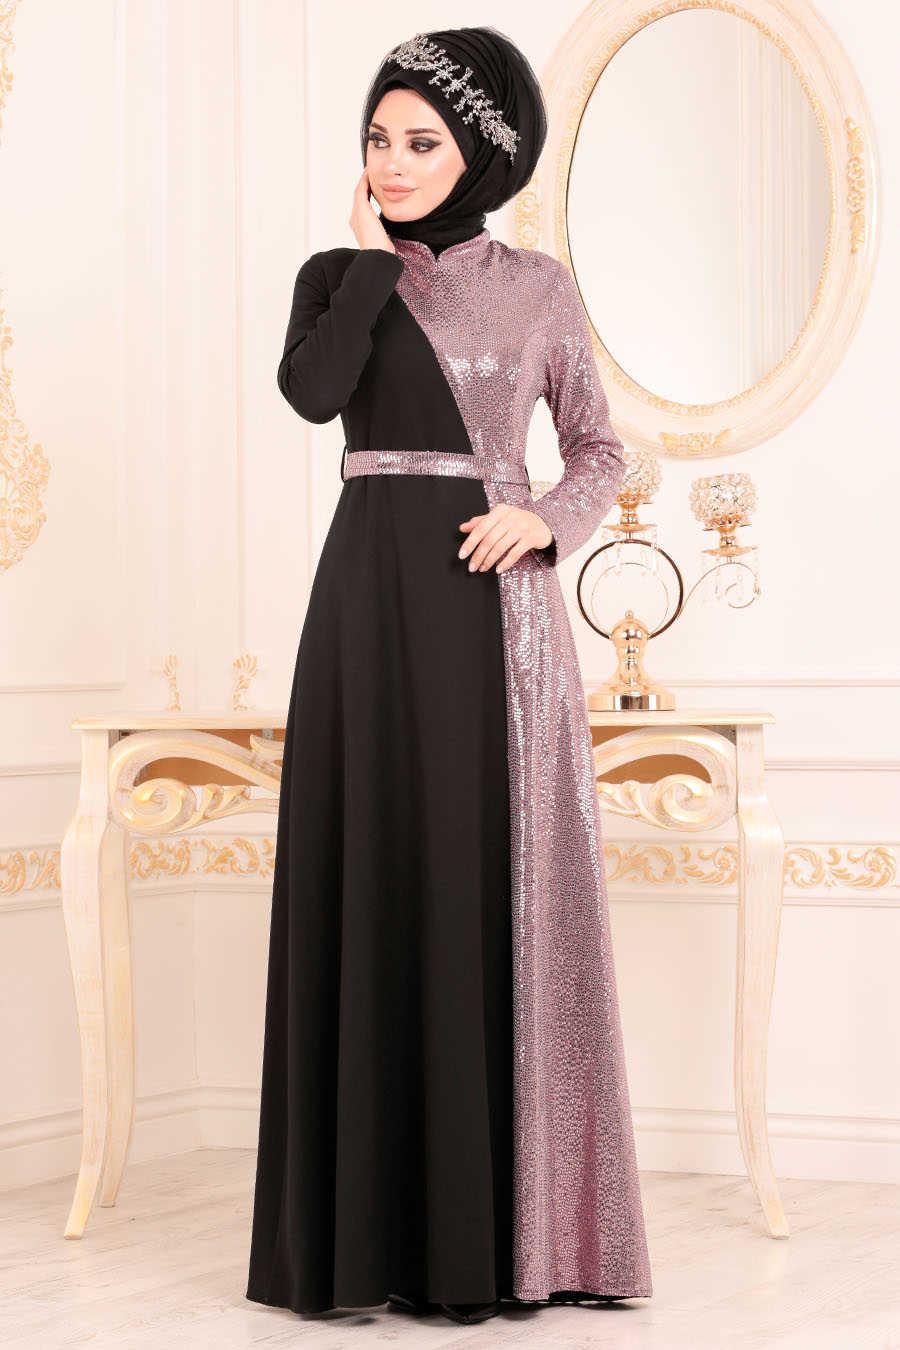 Neva Style - Dusty Rose Hijab Evening Dress 1234GK